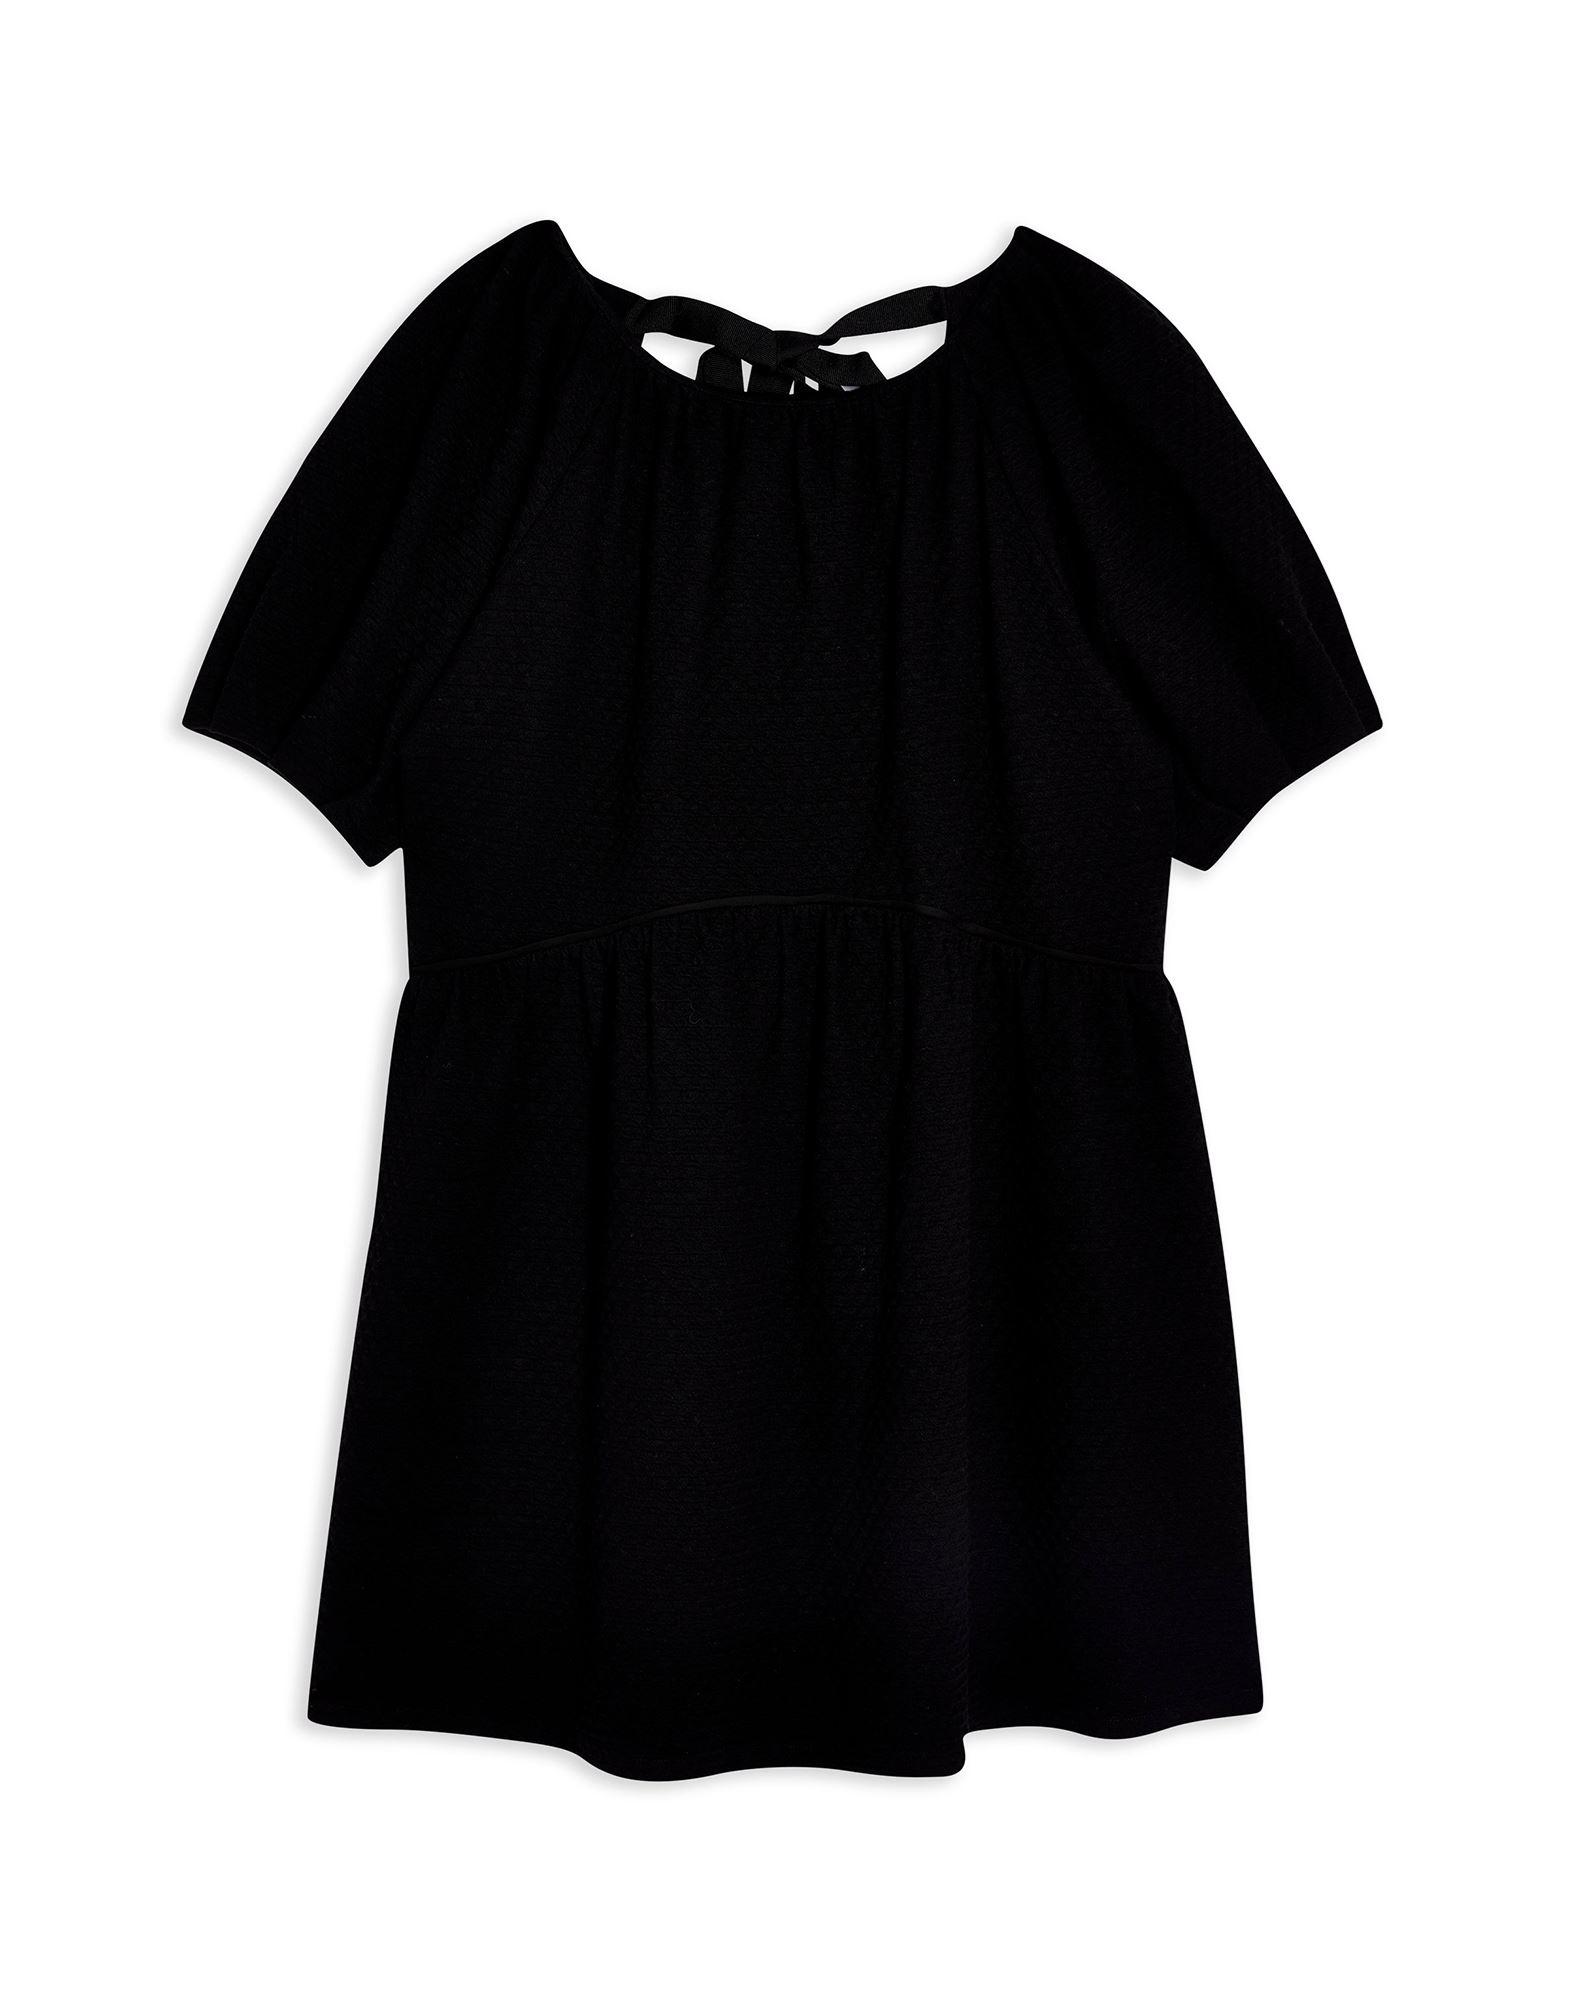 TOPSHOP トップショップ レディース ミニワンピース&ドレス TEXTURED BABYDOLL ブラック